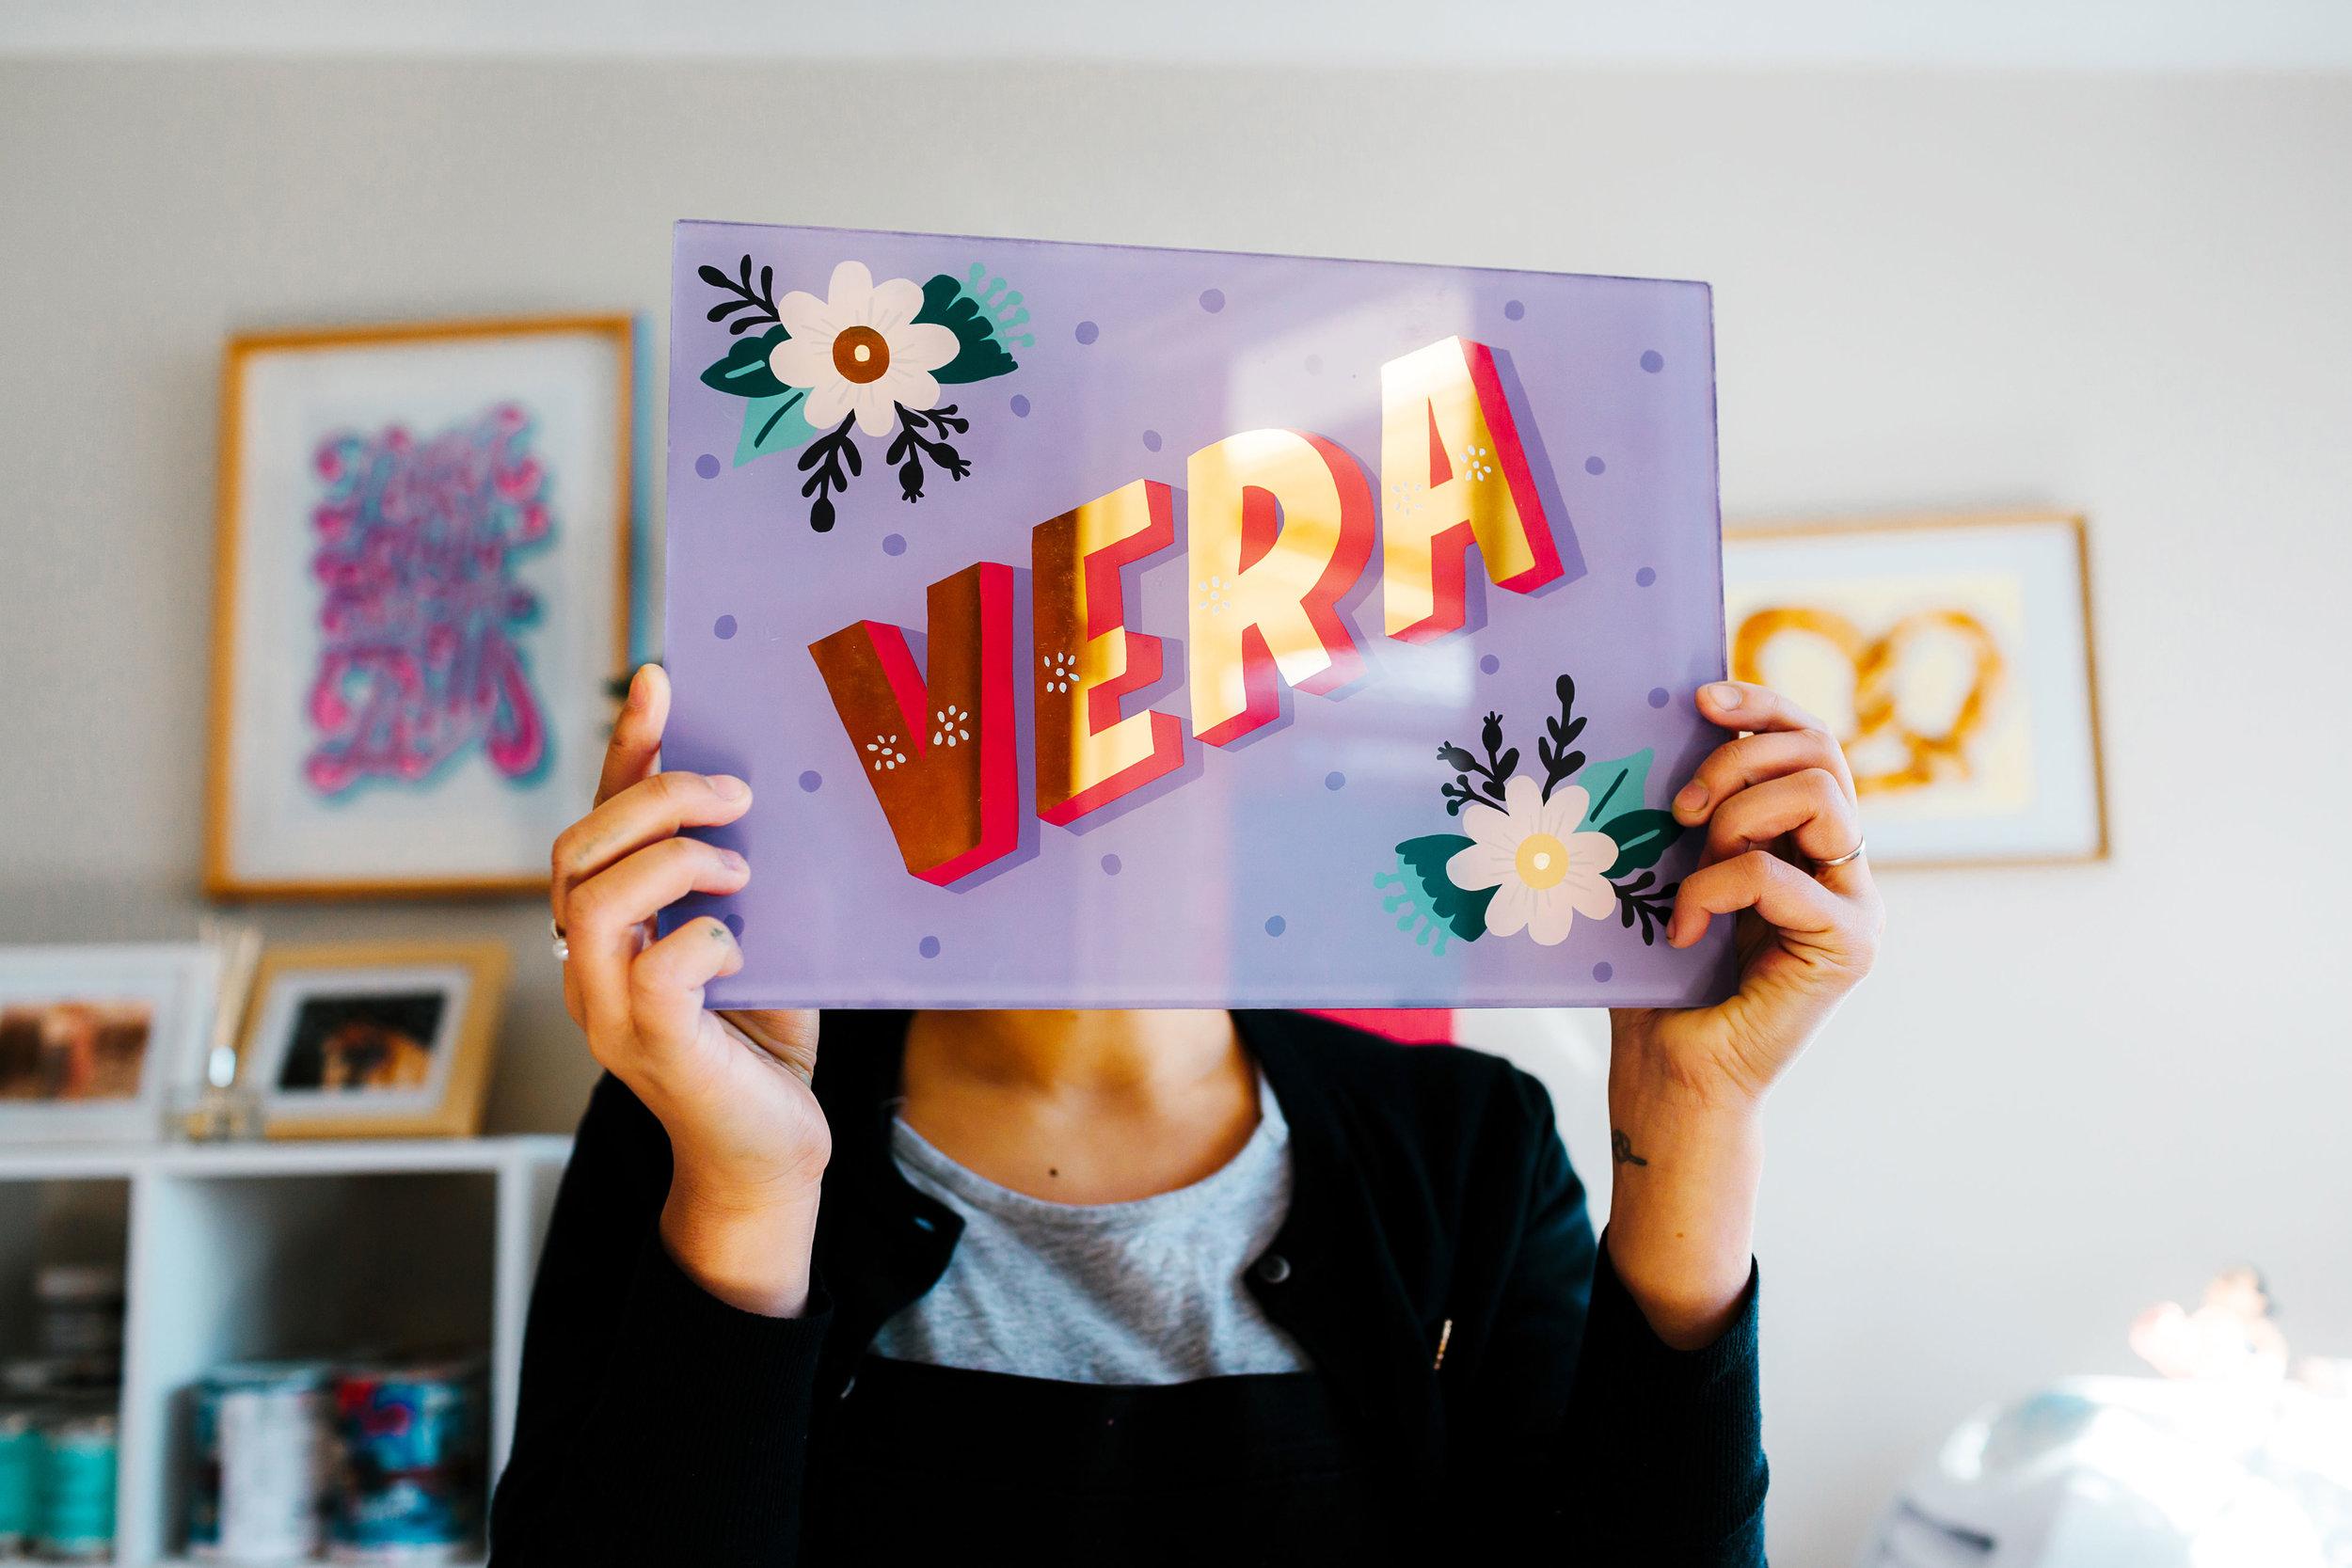 DE_Vera_001.jpg